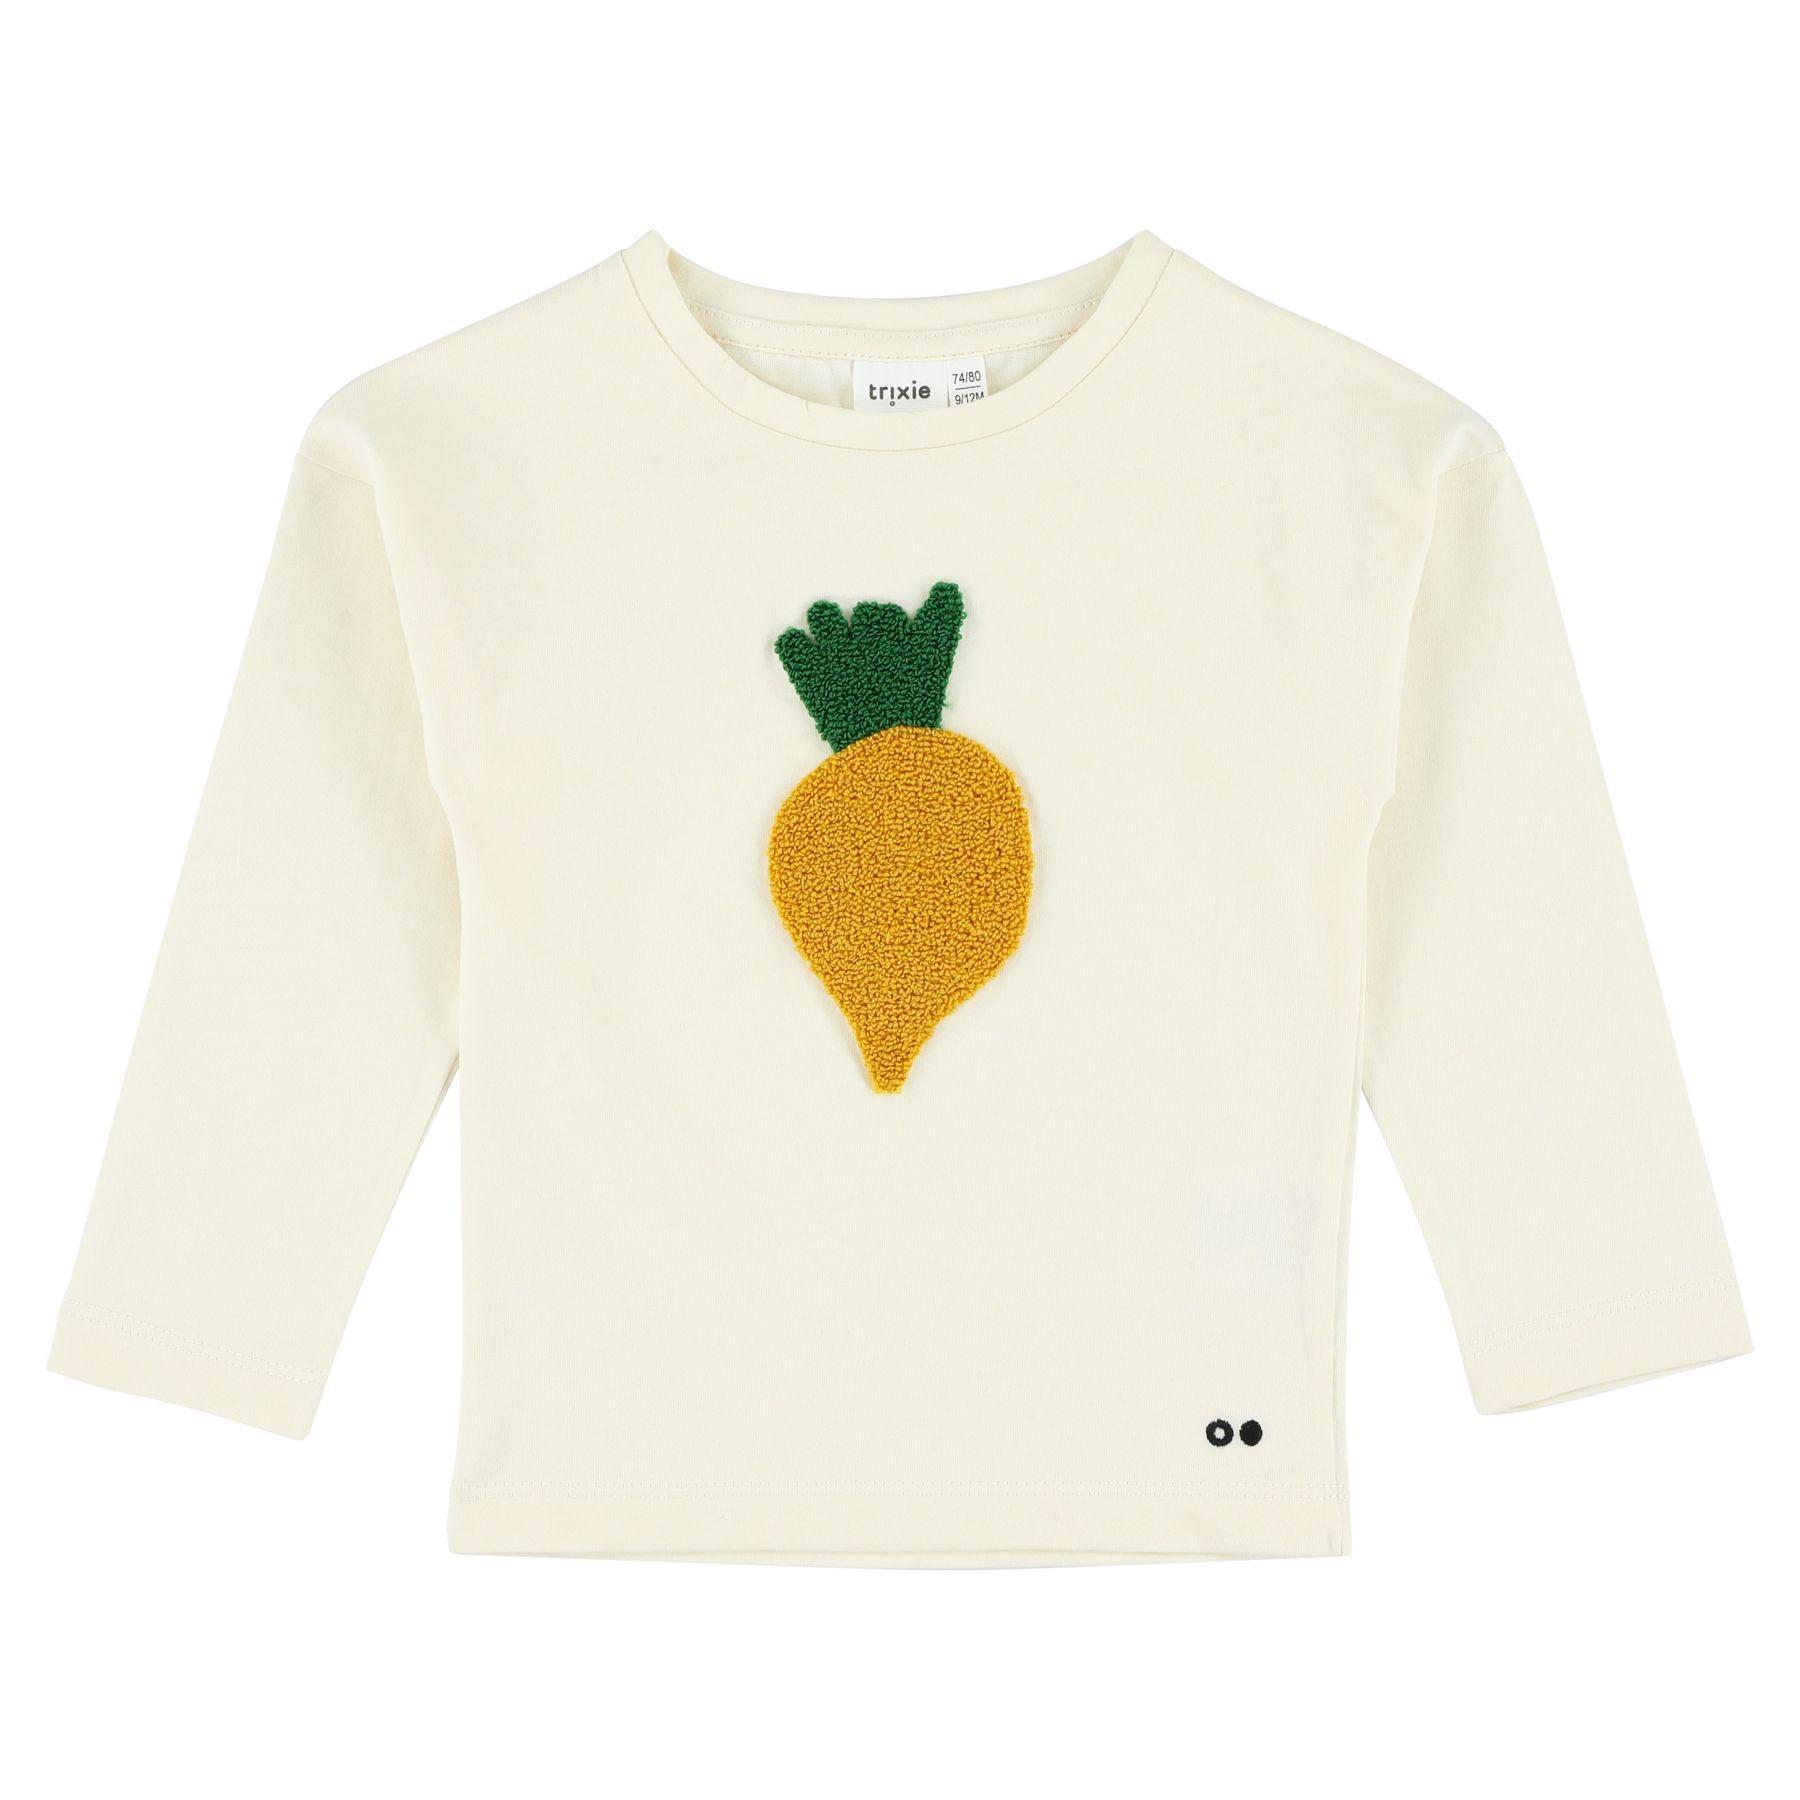 Trixie - T-shirt lange mouwen Tiny Turnip - 18-24M